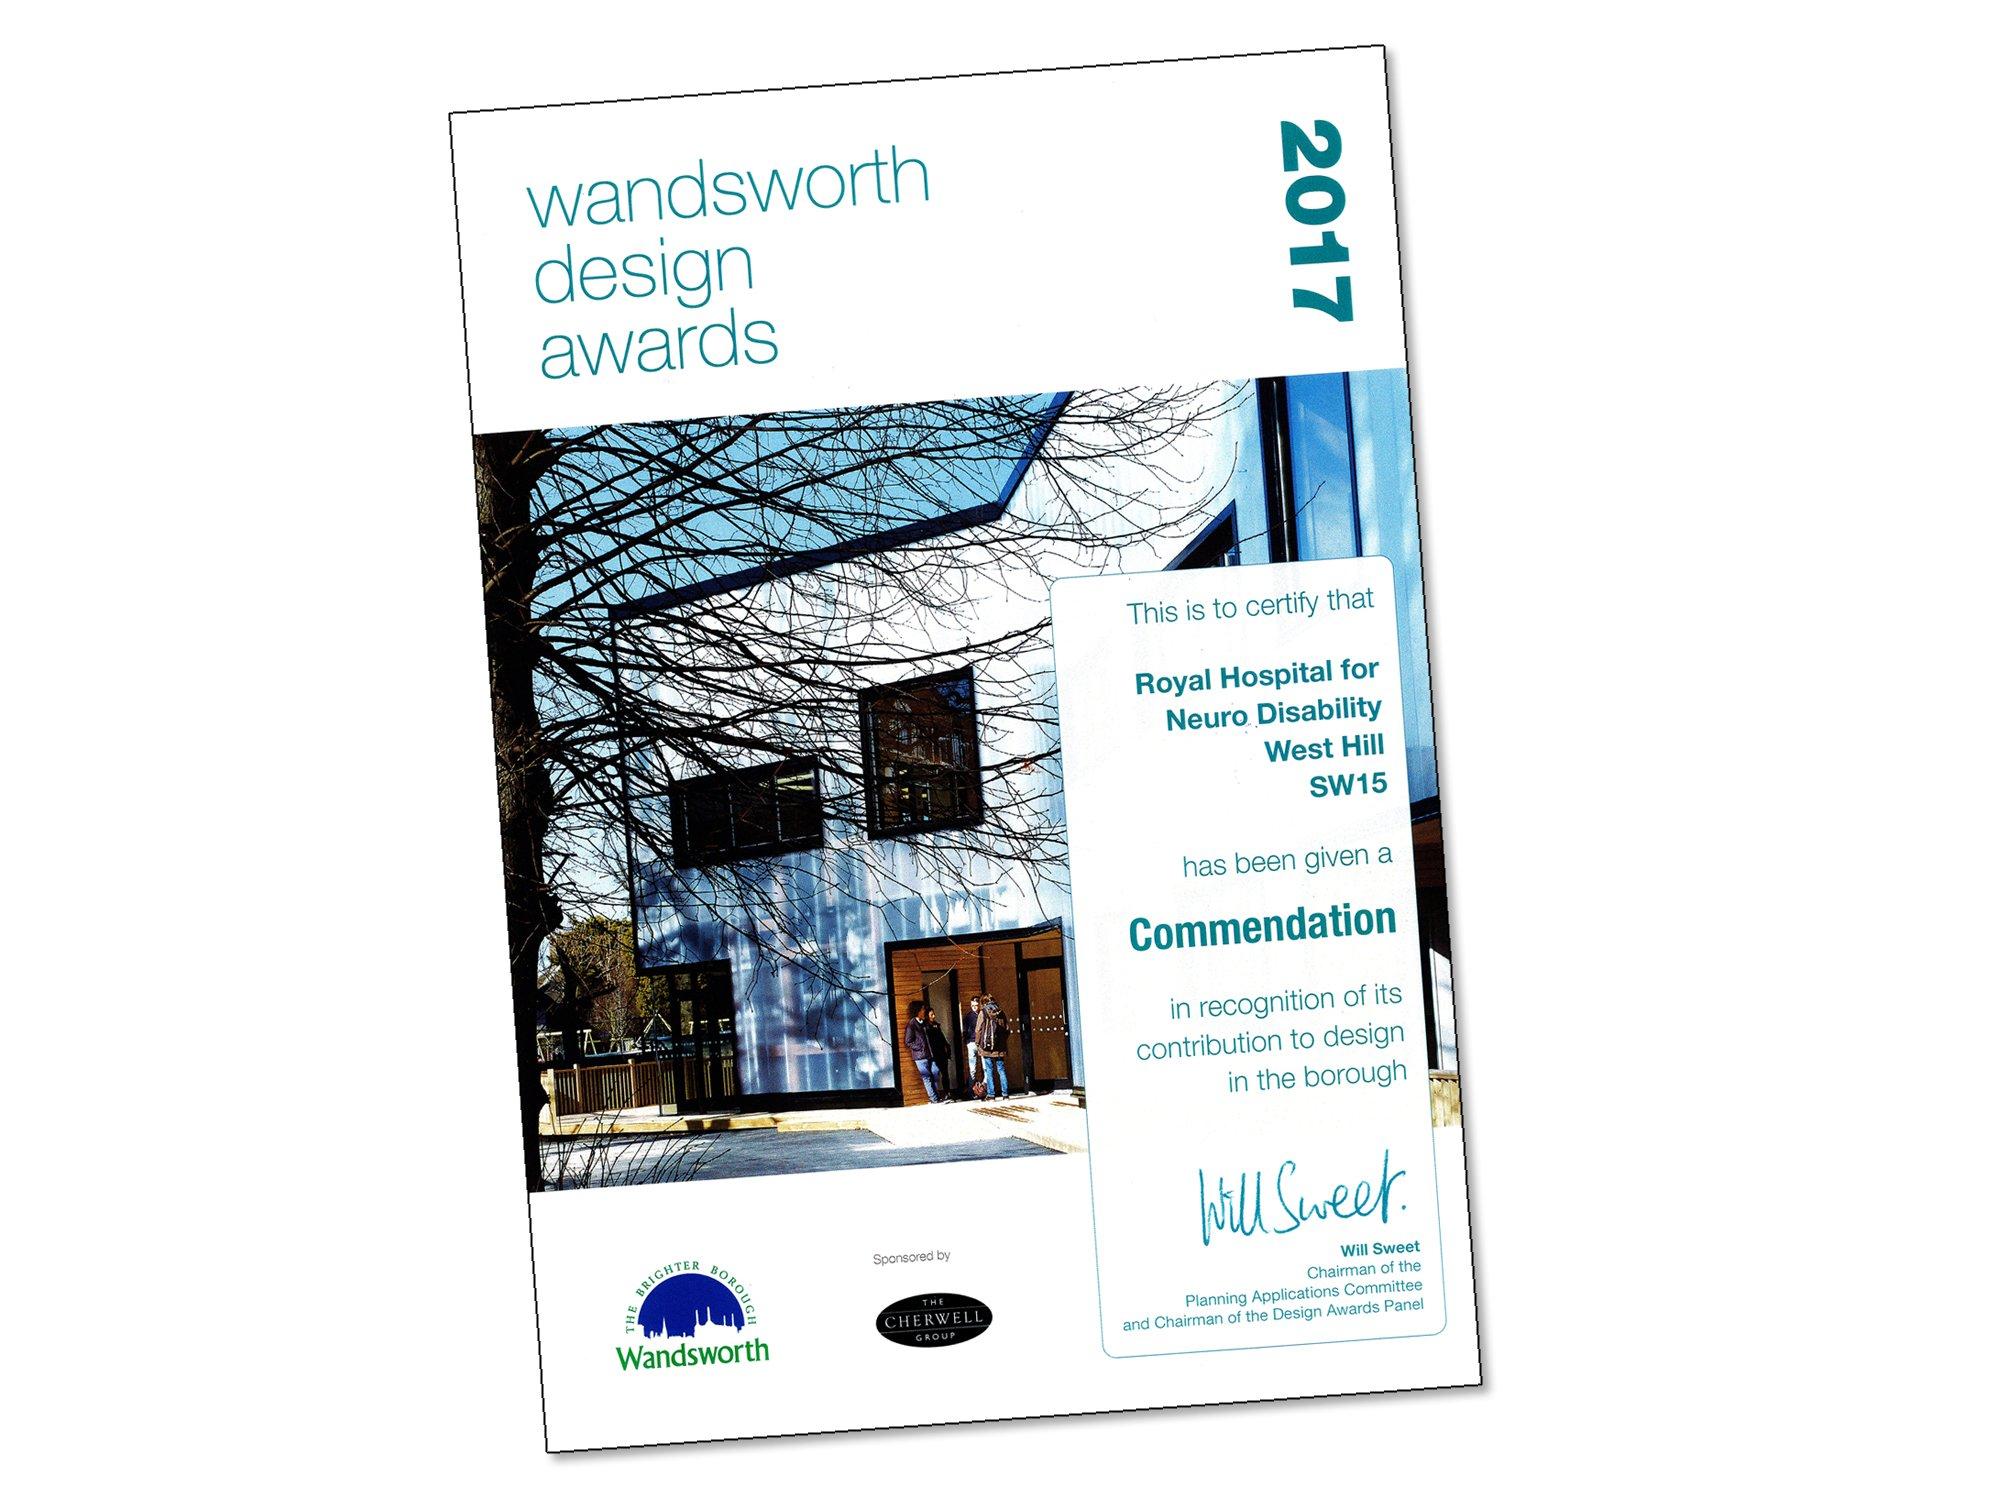 Wandsworth Design Awards 01